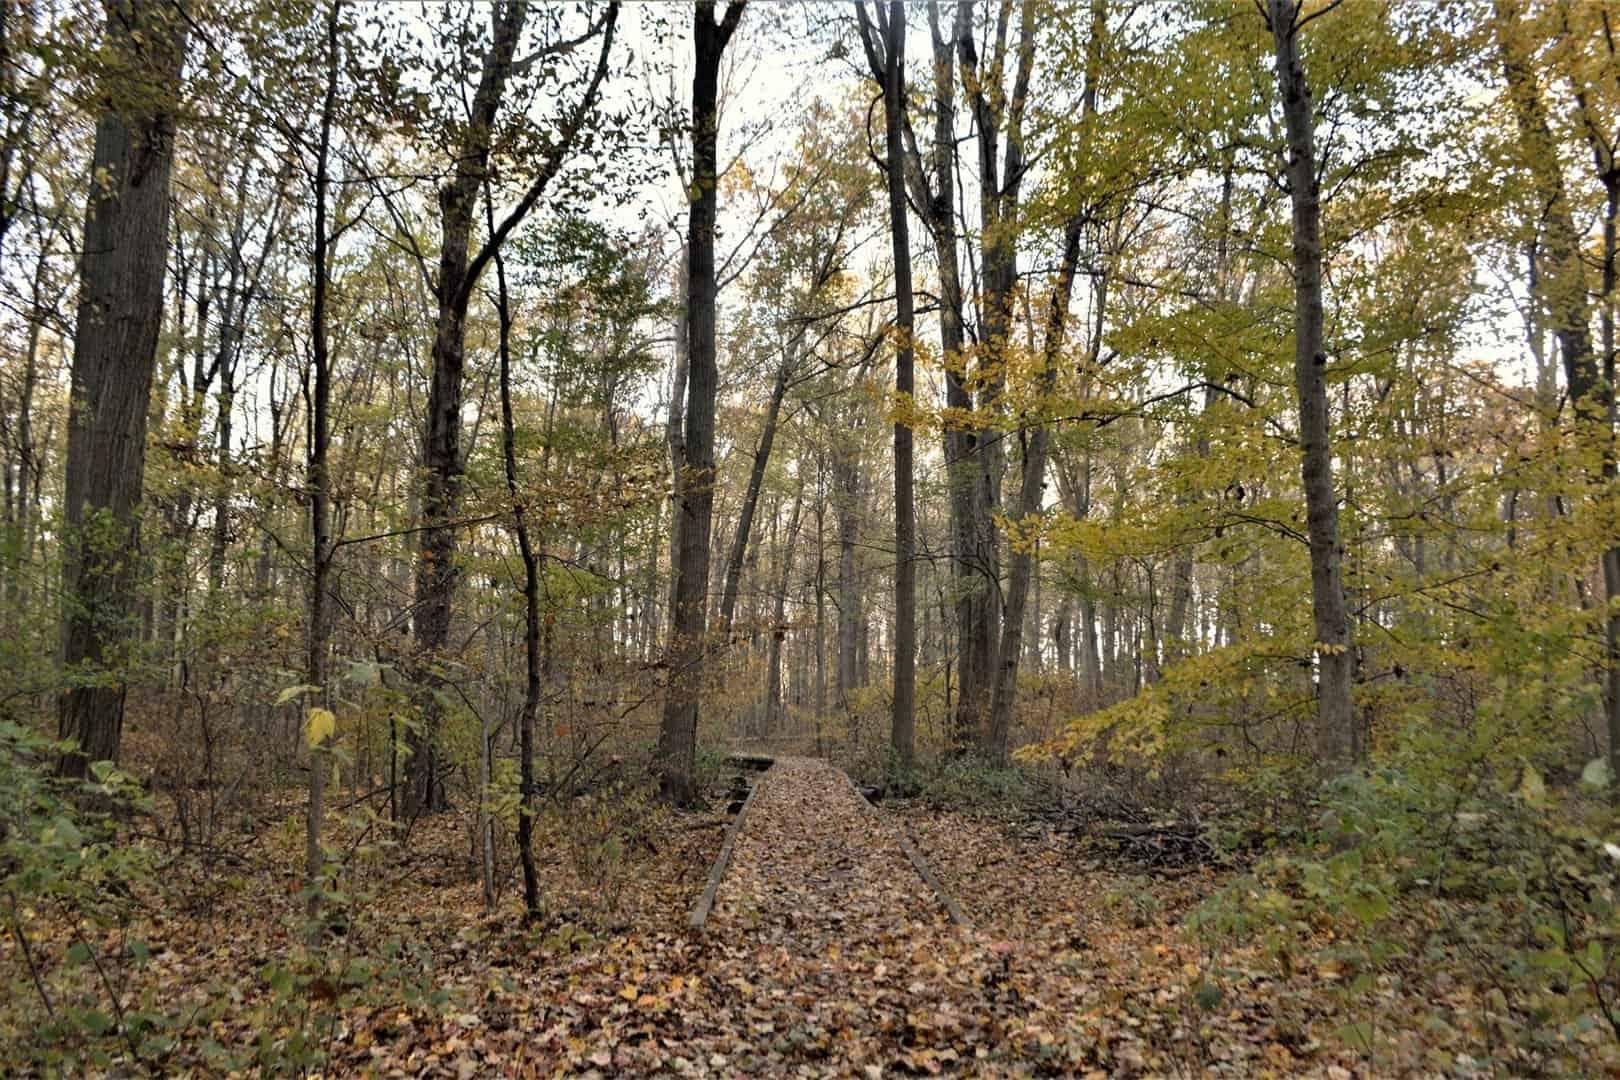 Trees and fallen leaves in Kopegaron Woods